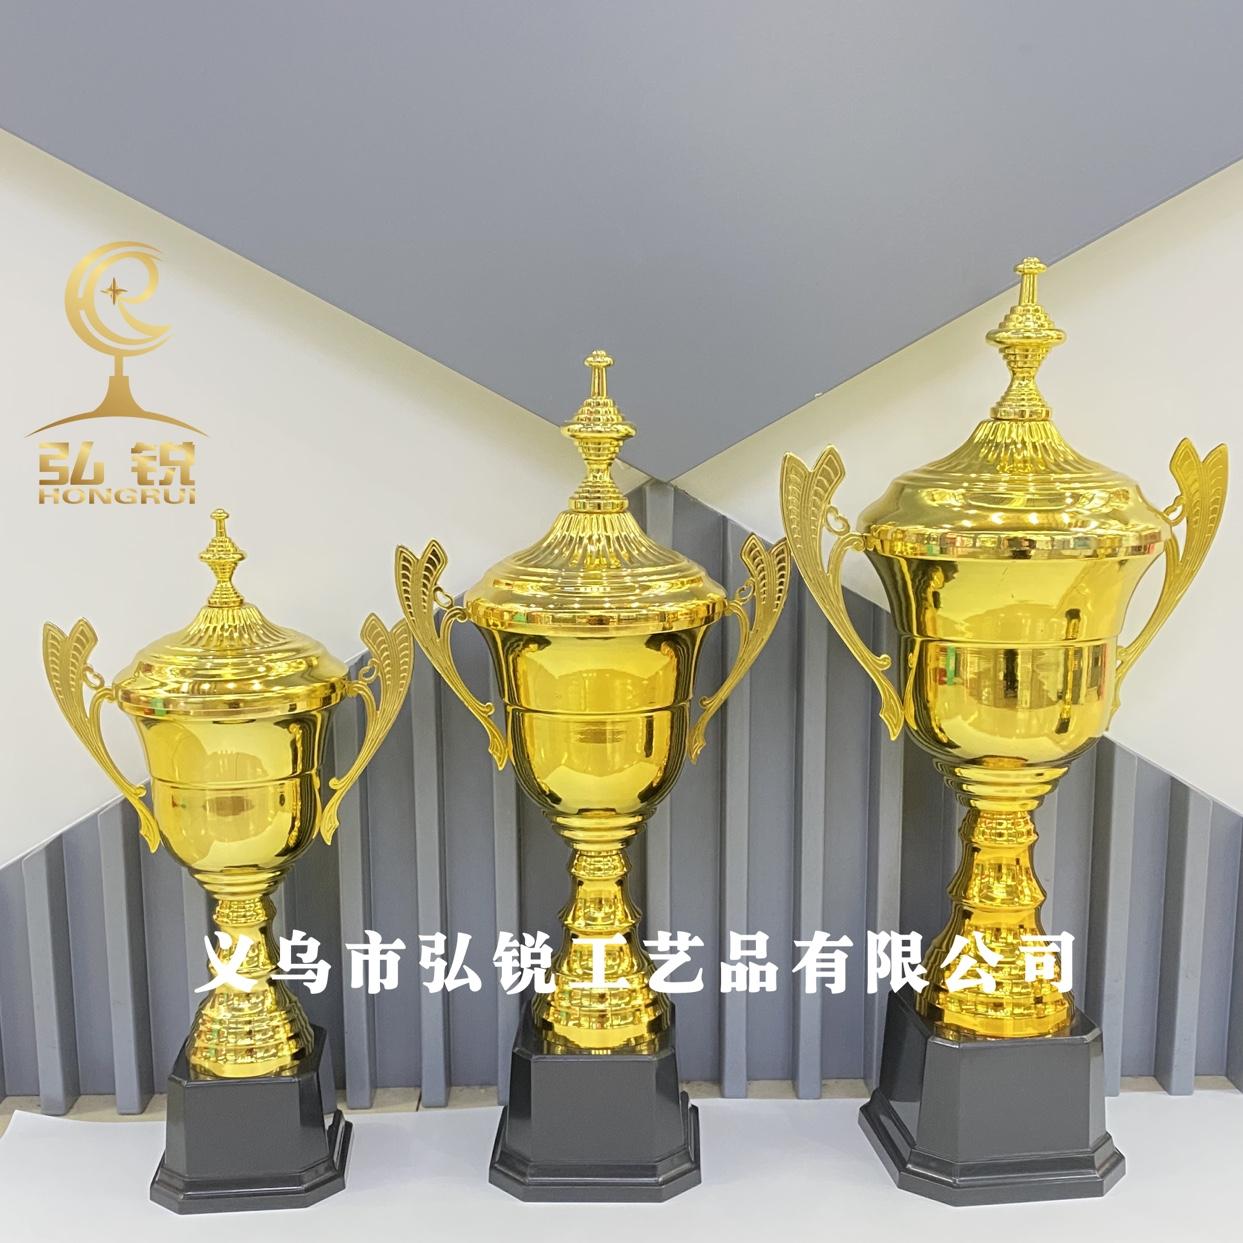 HR-4005B高档金属奖杯14*49CM电镀金属比赛奖励奖品可定制logo